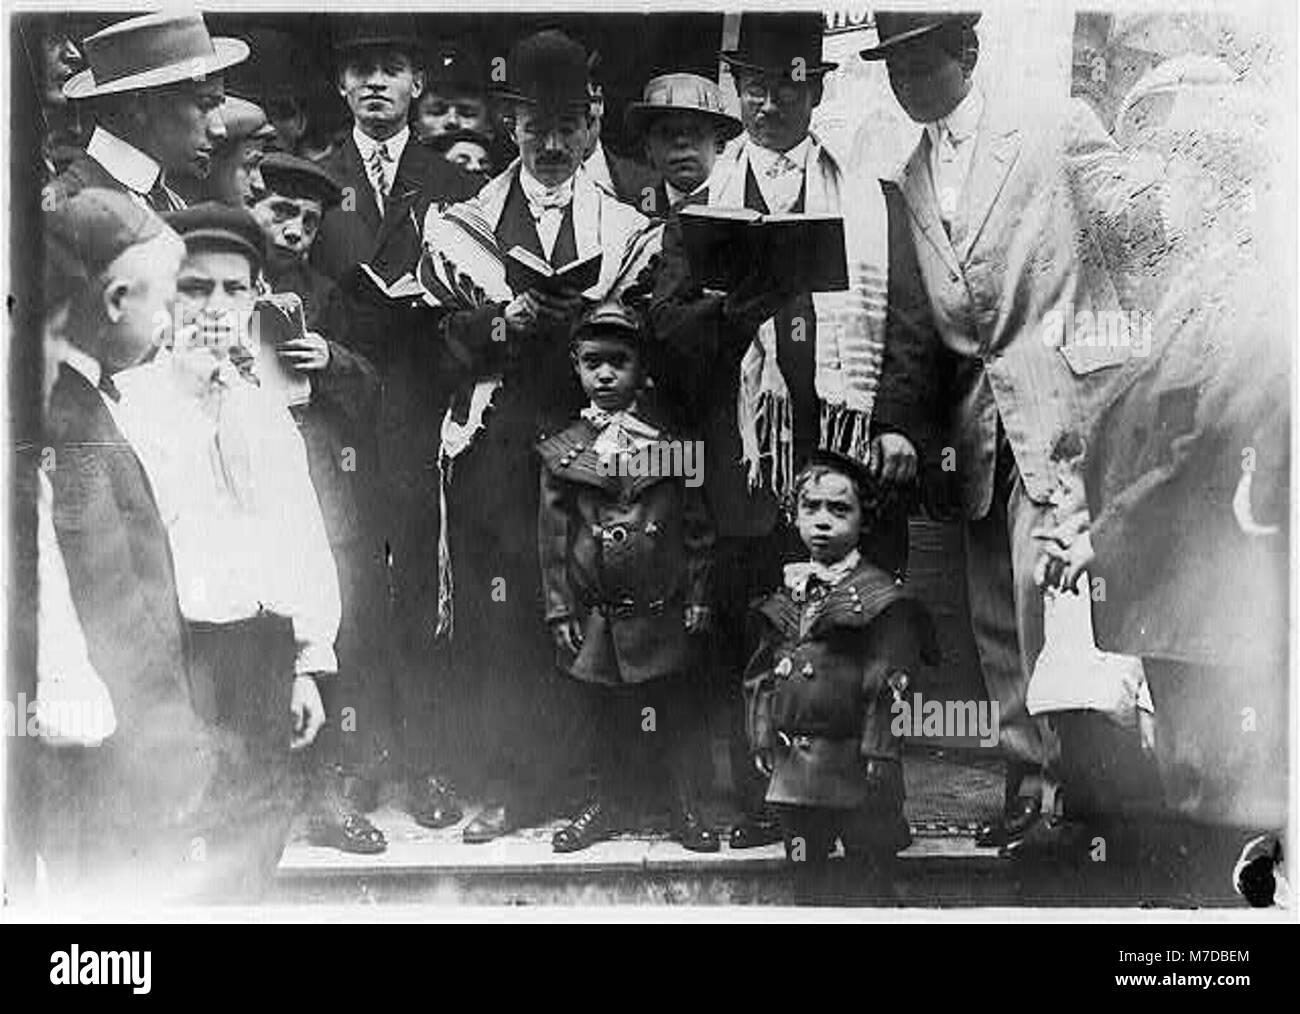 Jewish life - Jews praying on Jewish New Year LCCN2003665472